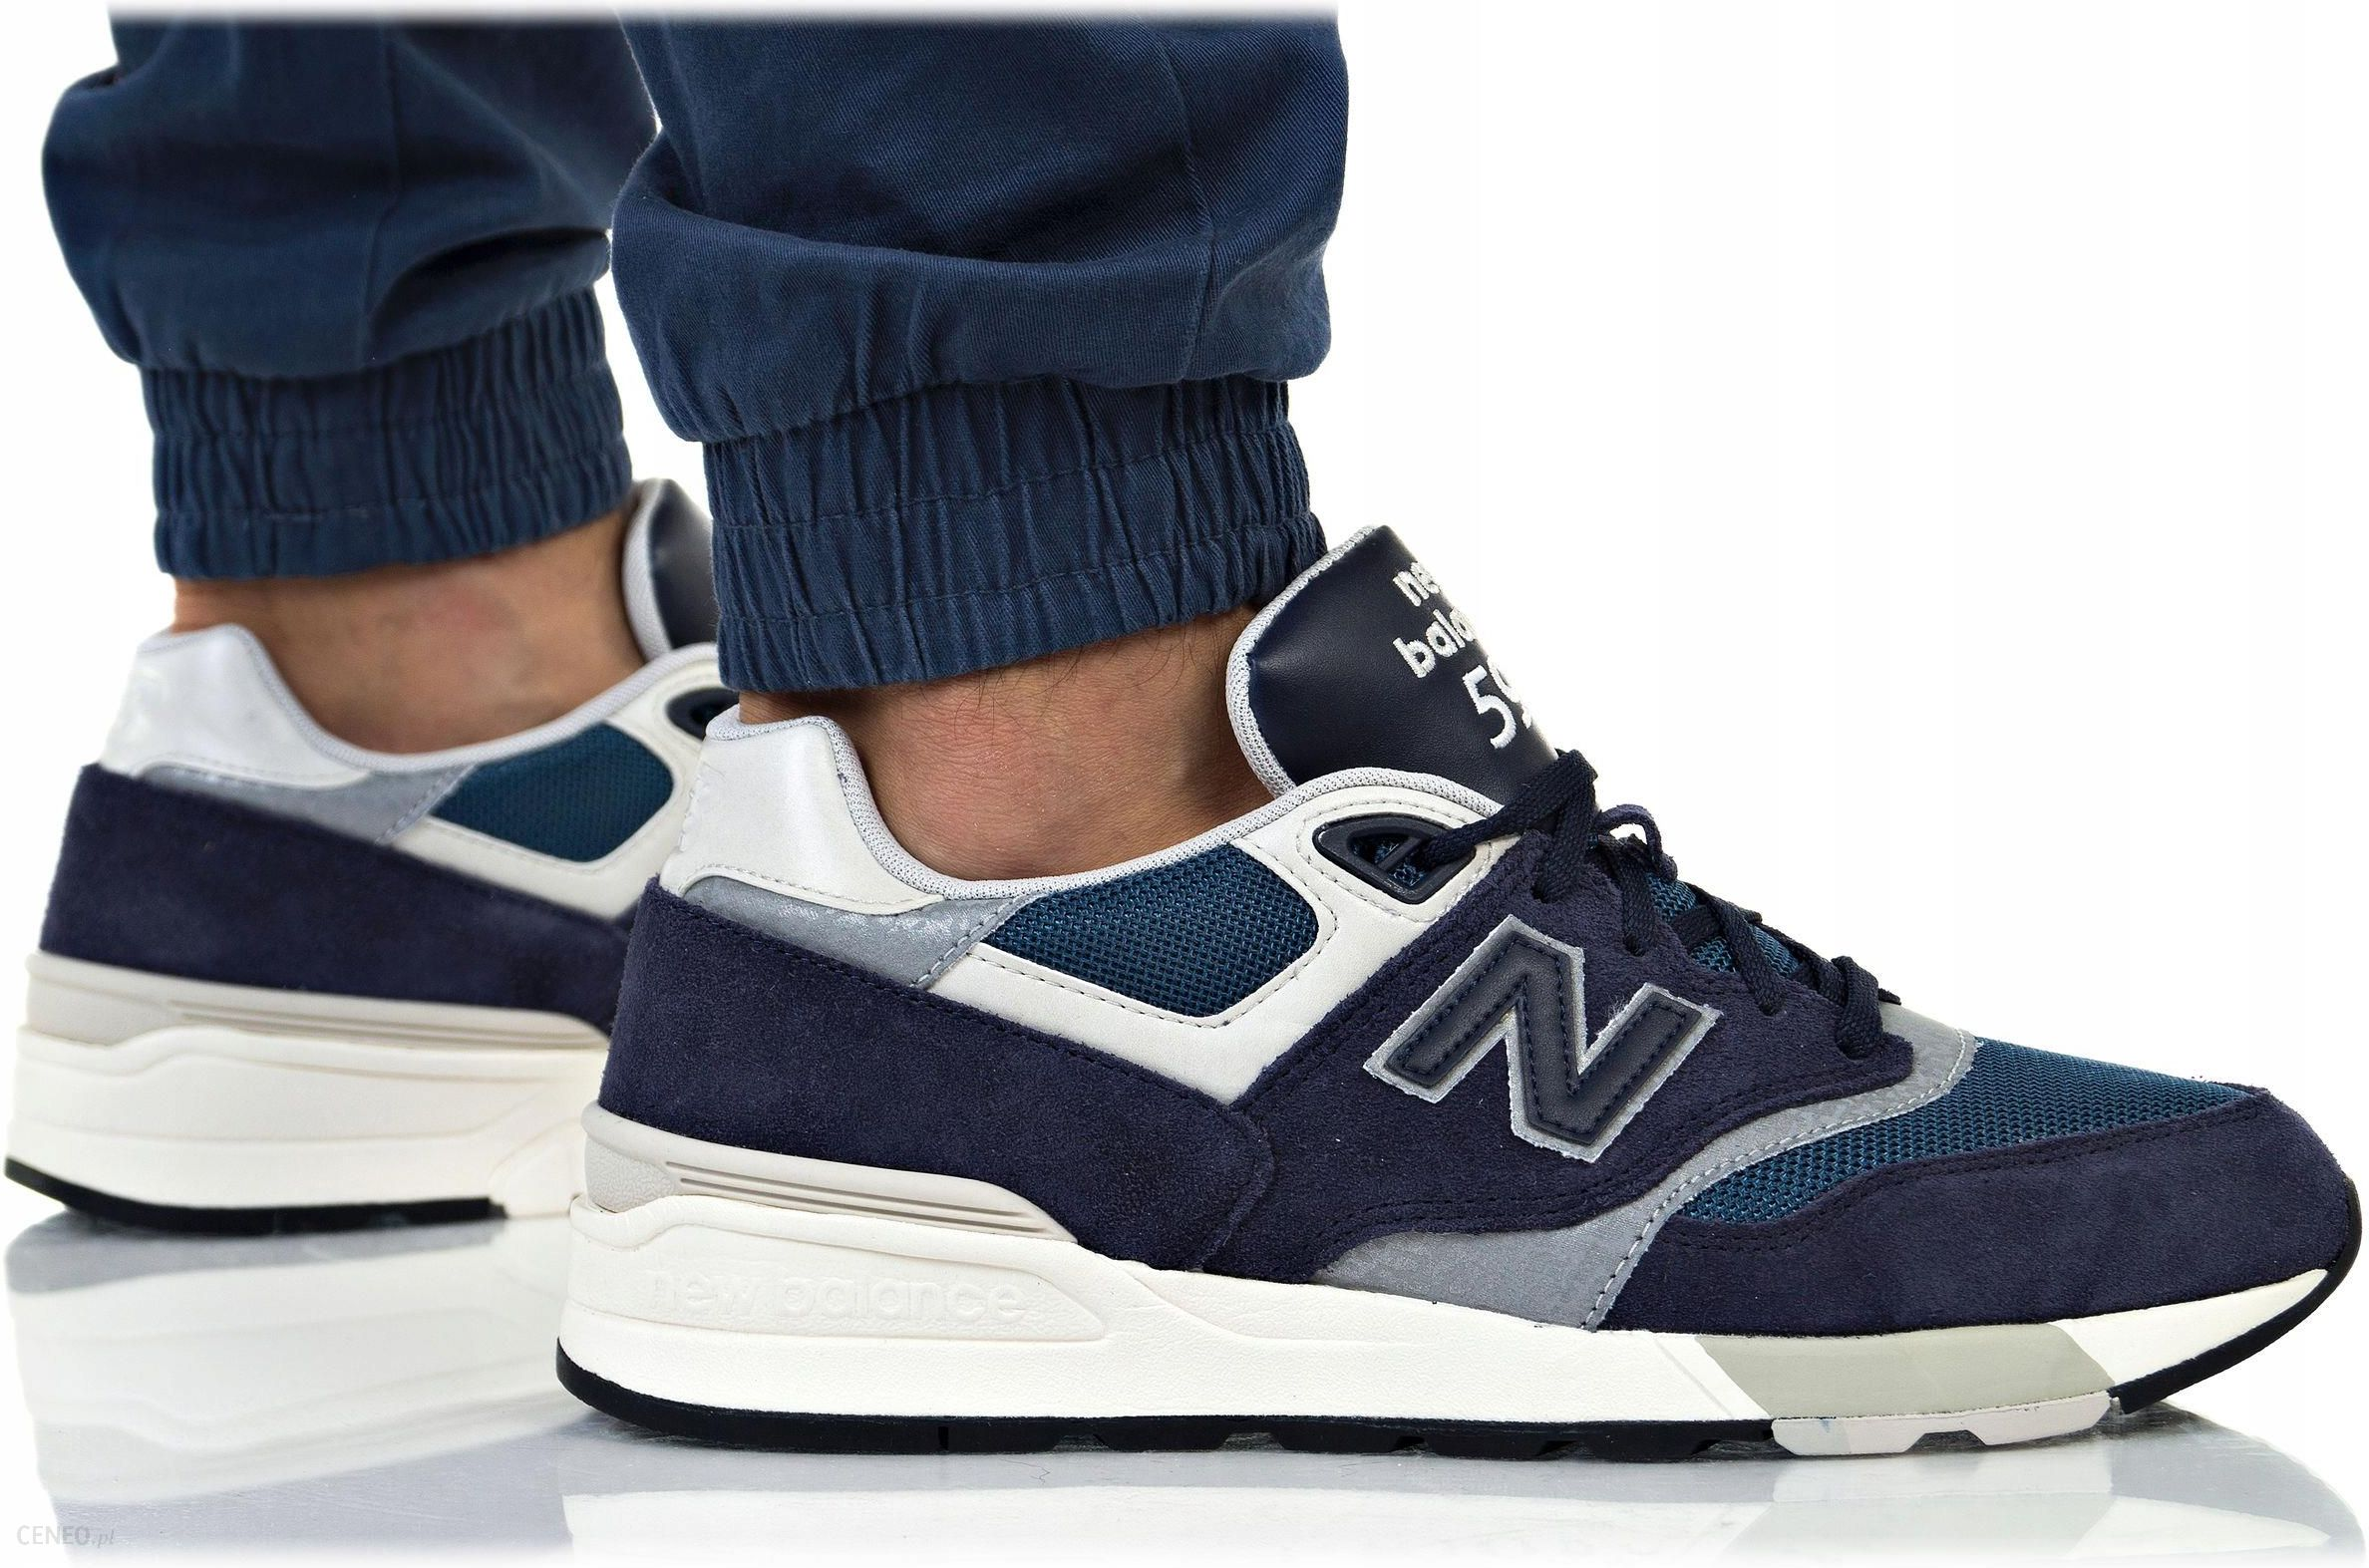 best sneakers 9d8ad 01620 Buty New Balance Męskie 597 ML597AAA Granatowe - zdjęcie 1